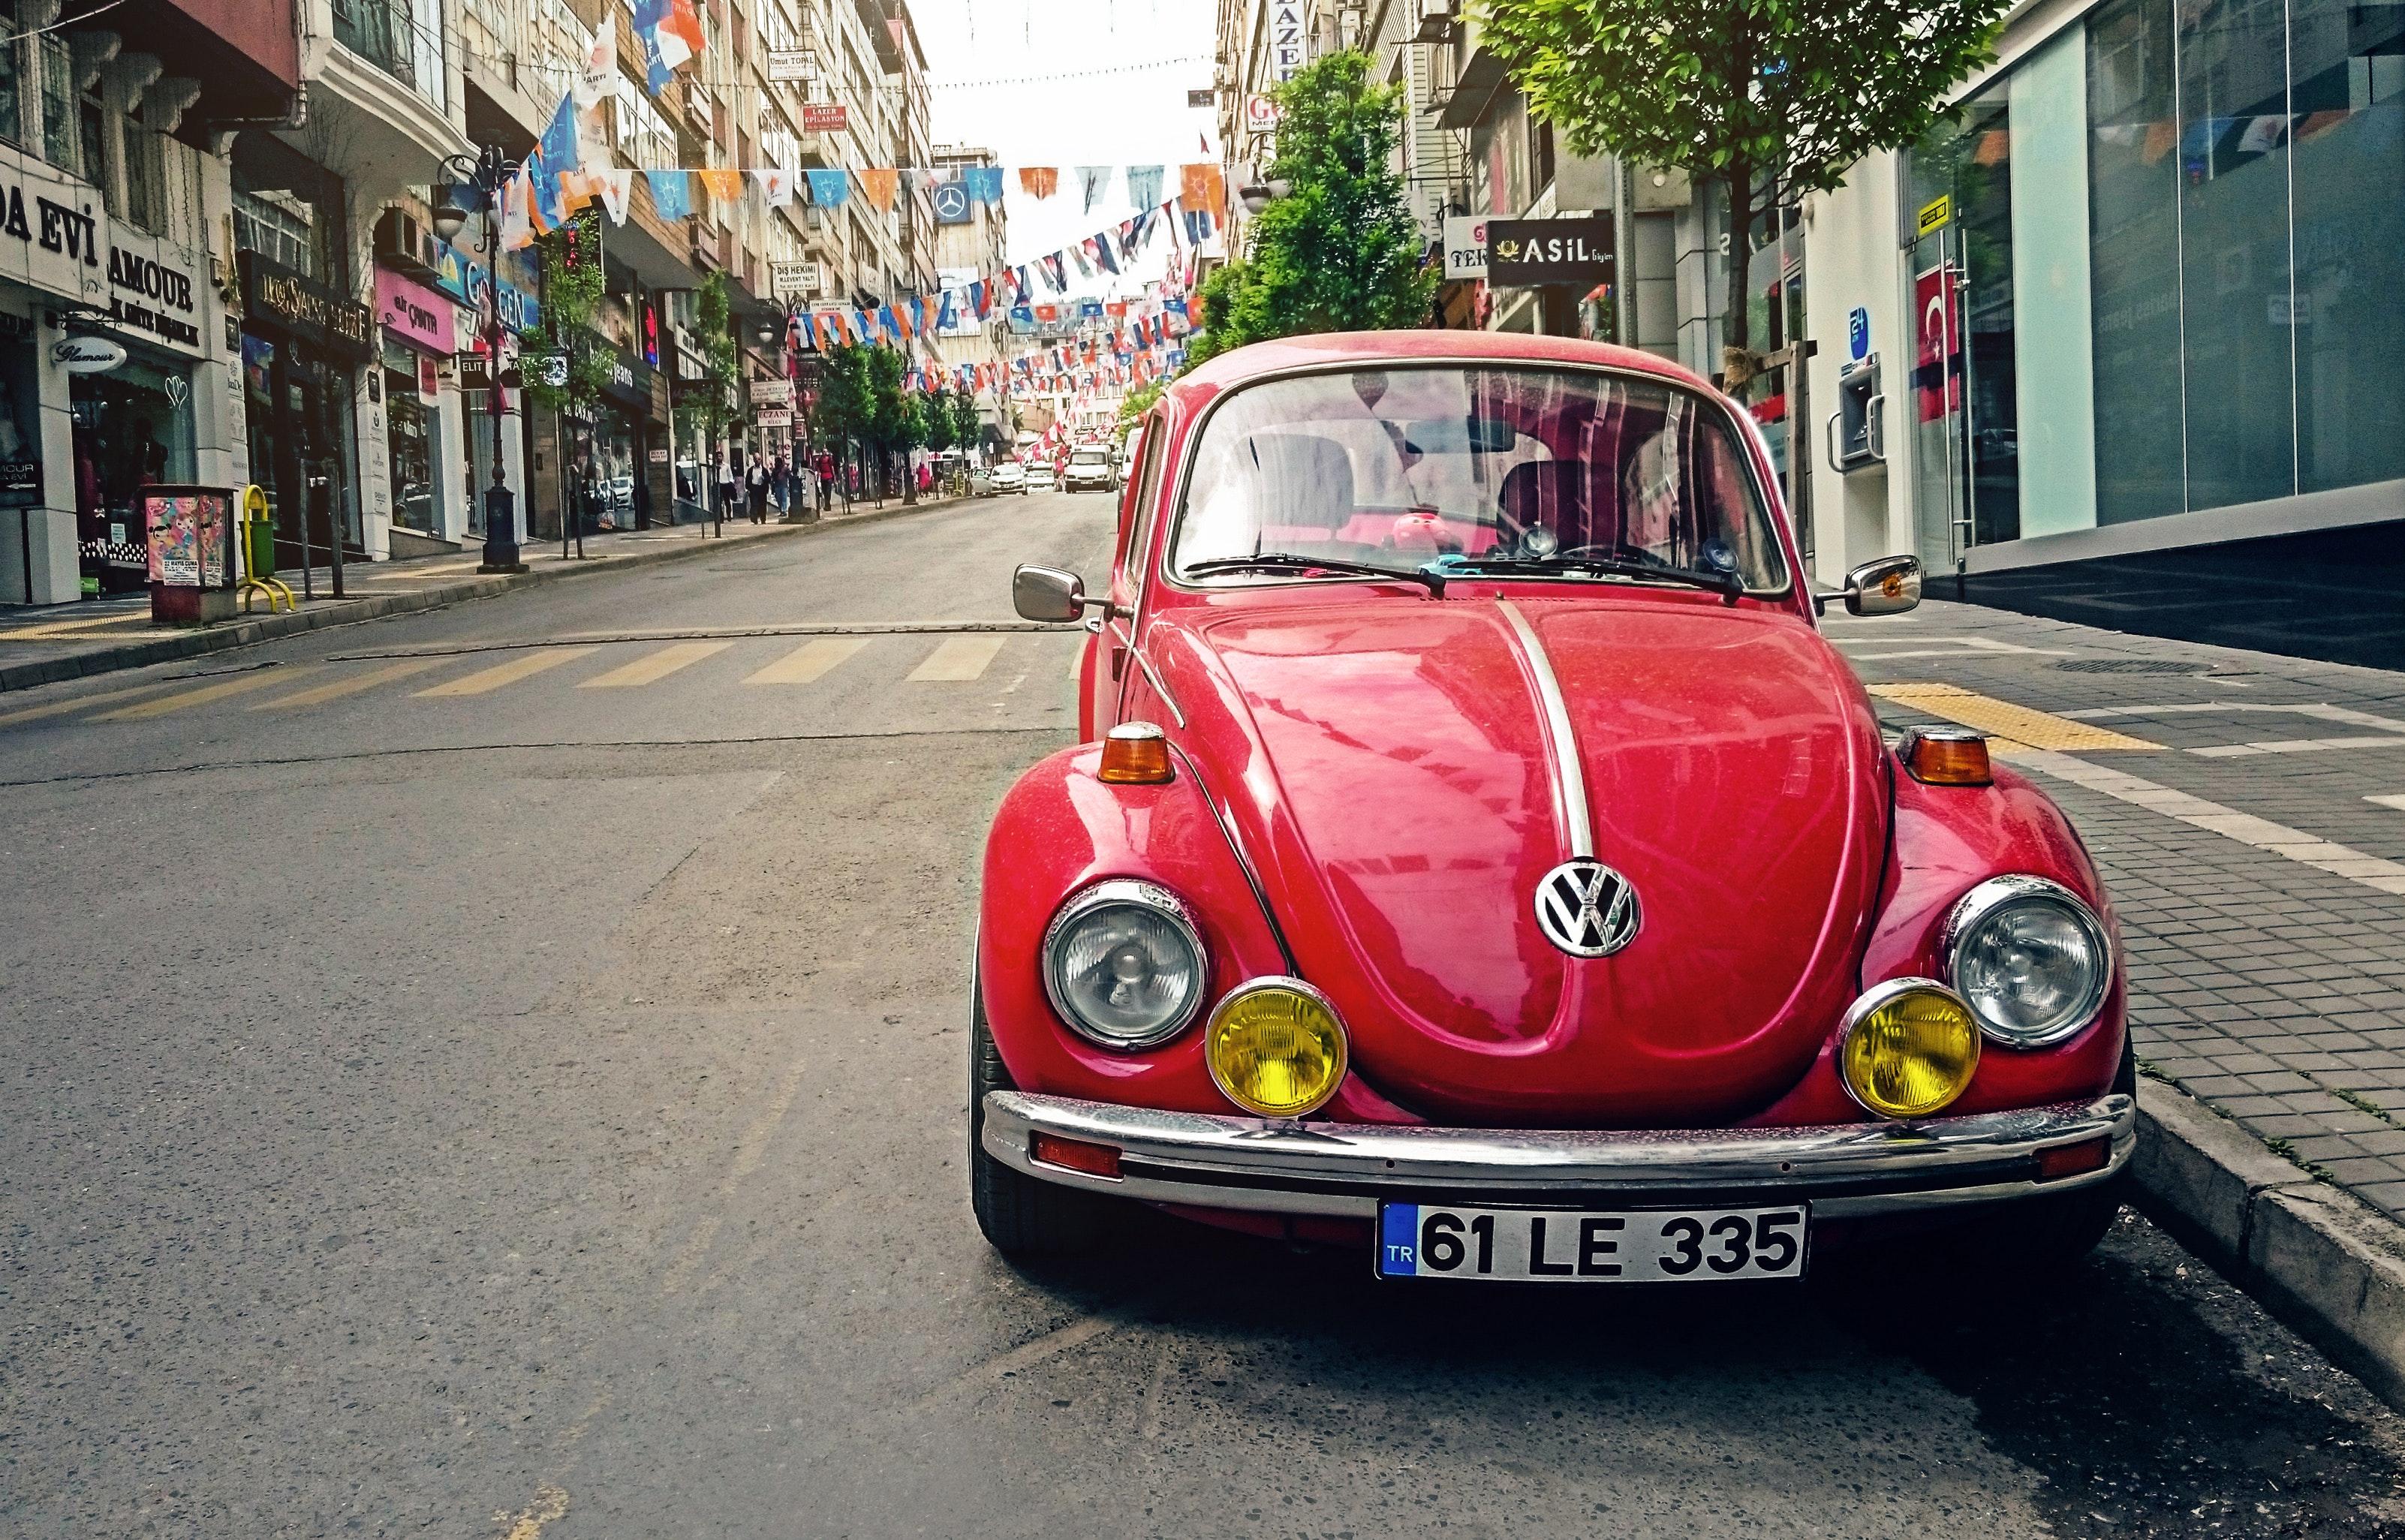 Red Volkswagen Beetle Parked at Road Side Near Pedestrian Lane, Automotive, Sidewalk, Volkswagen, Vintage, HQ Photo